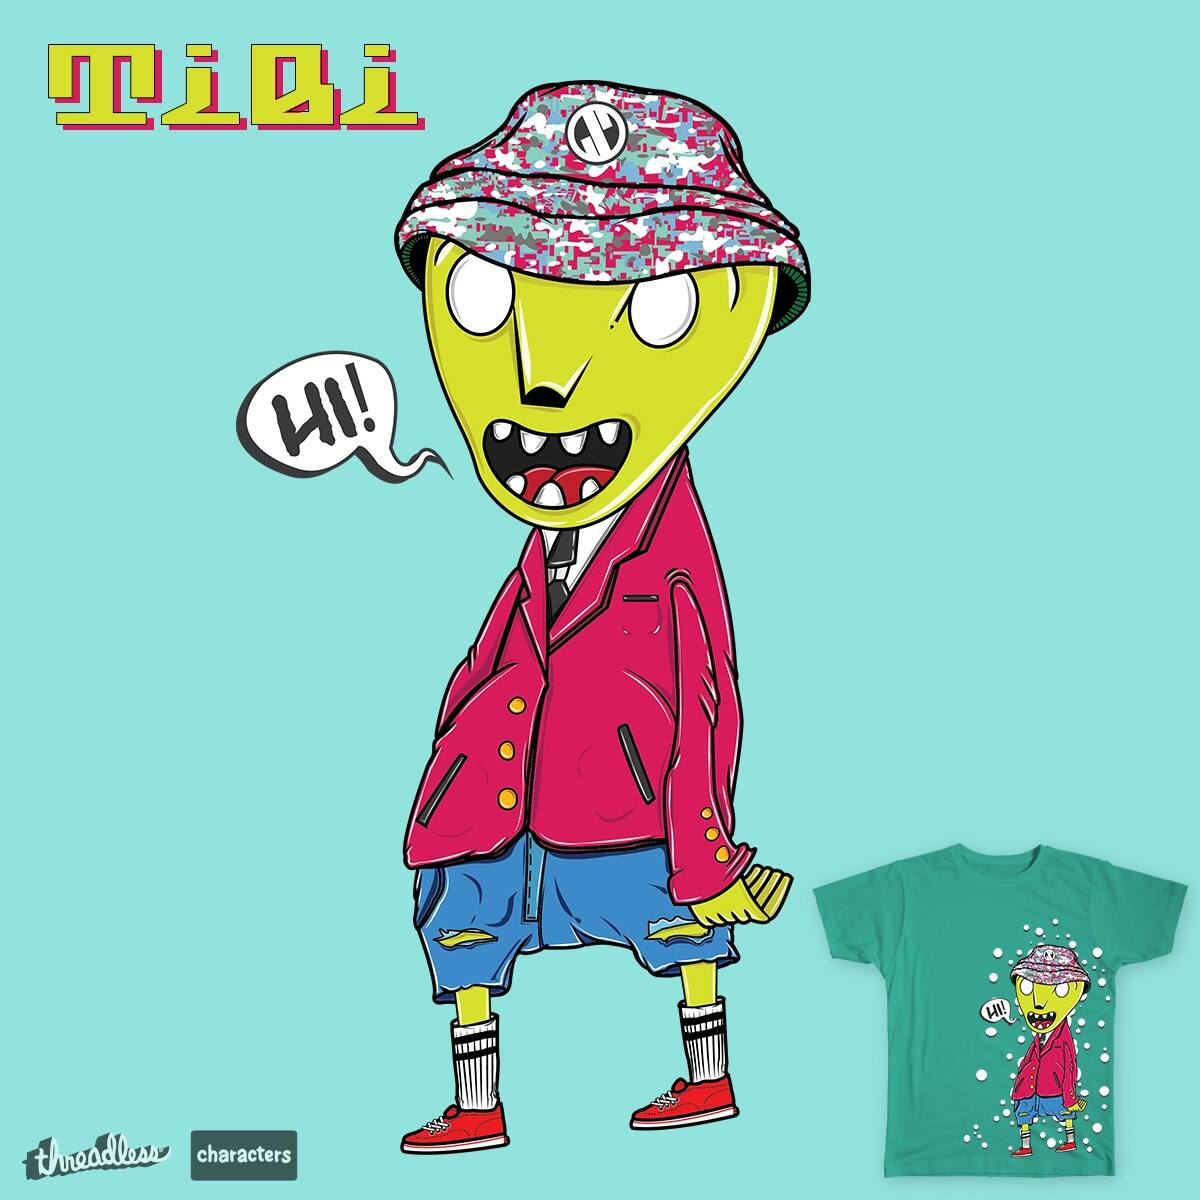 Tibi by BVDOT on Threadless